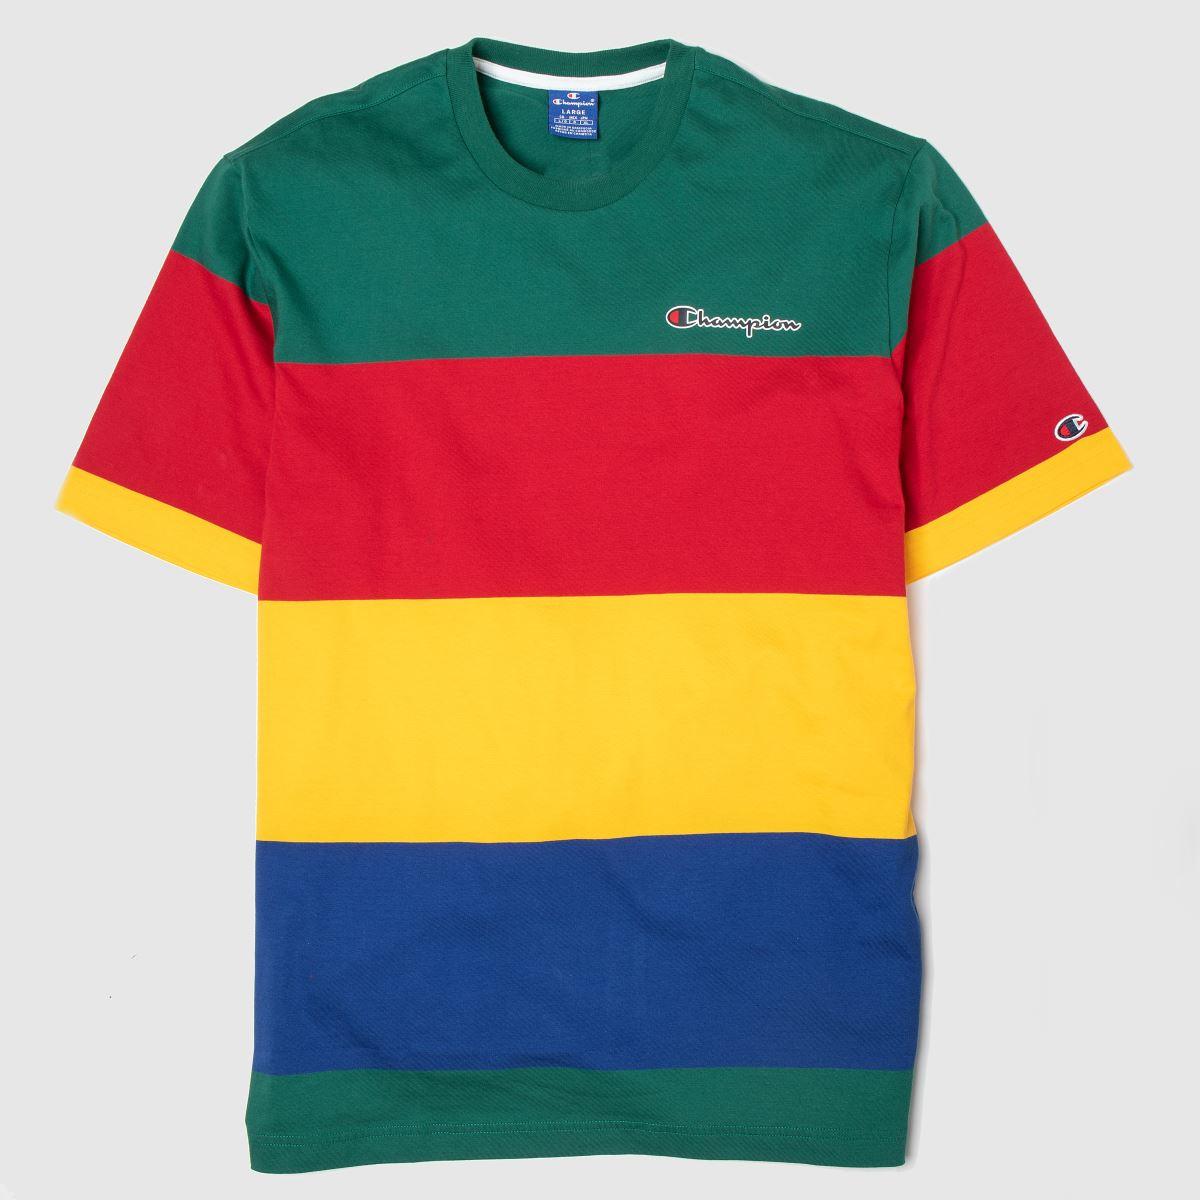 Champion Clothing Champion Green & Red Crewneck T-shirt